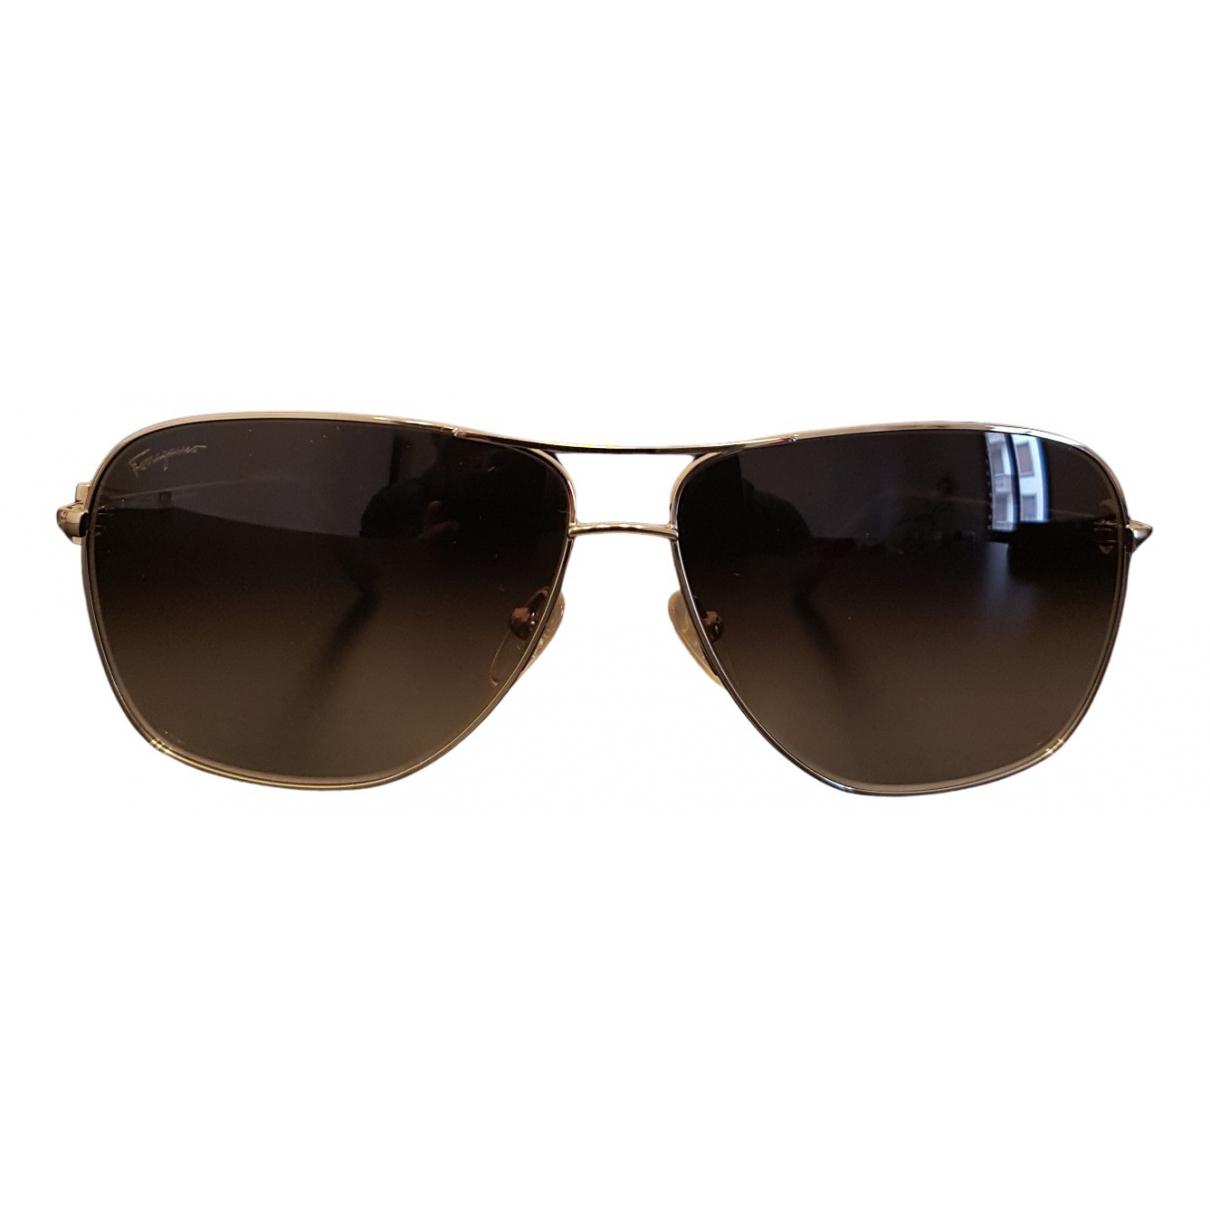 Salvatore Ferragamo N Gold Metal Sunglasses for Men N